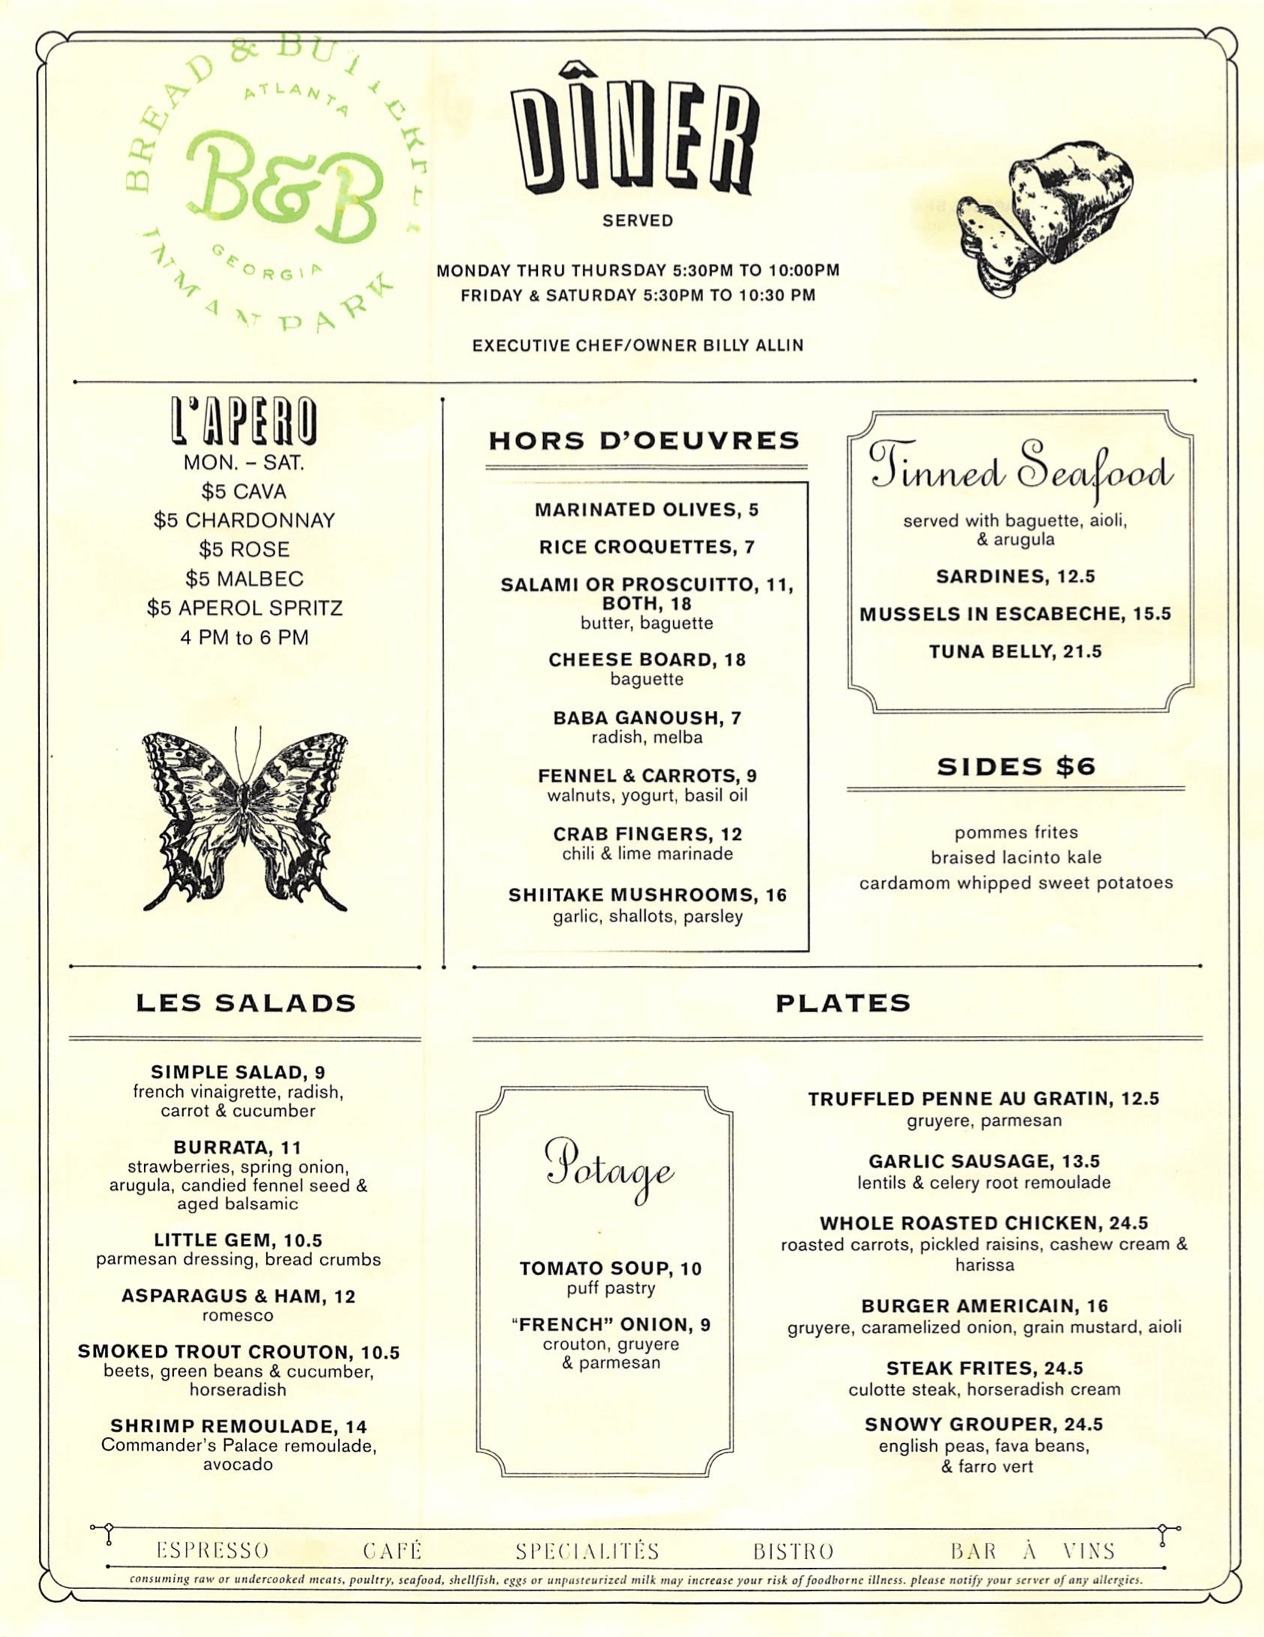 Diner copy.jpg